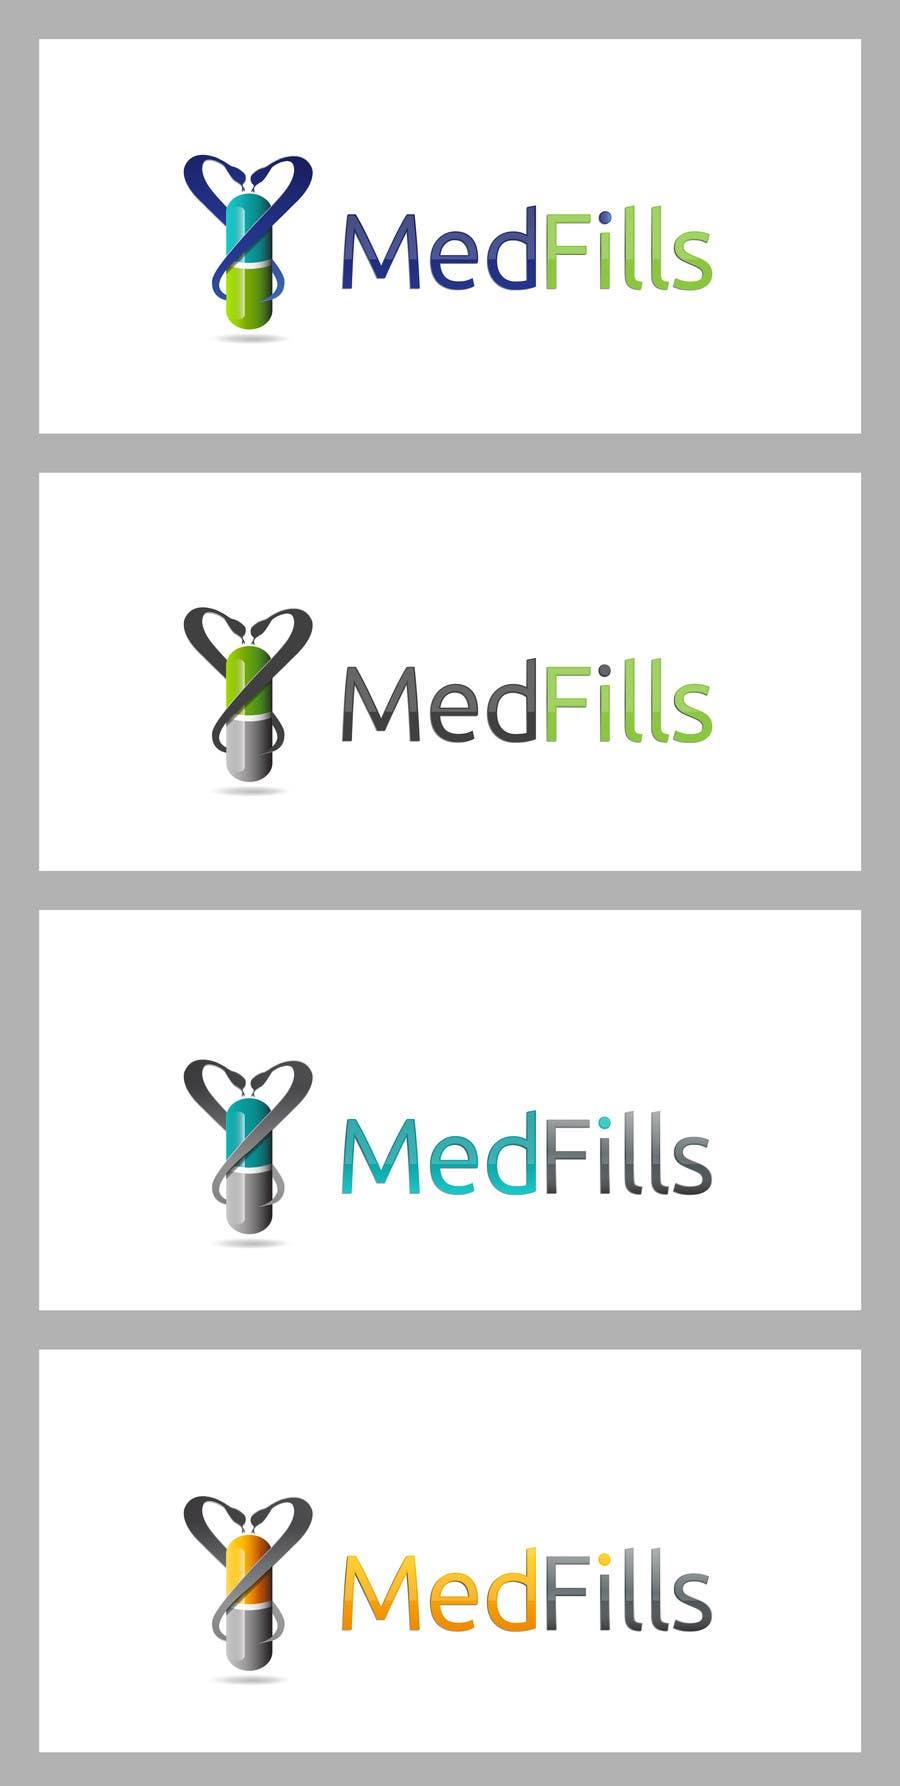 Bài tham dự cuộc thi #70 cho Design a Logo for my Medication Management Business